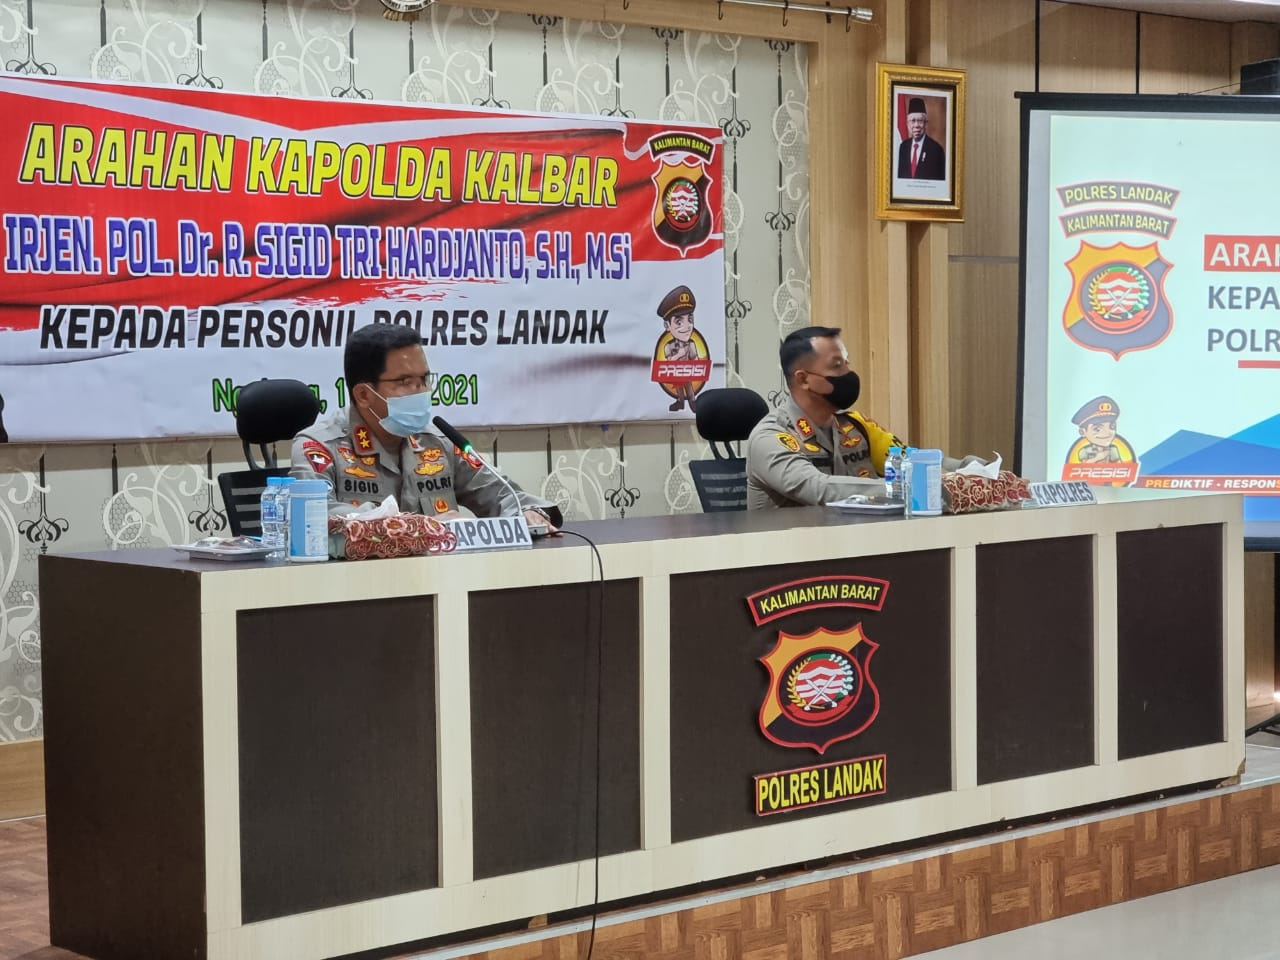 Kunjungi Polres Landak, Kapolda Kalbar Tinjau Perkembangan Kasus COVID-19